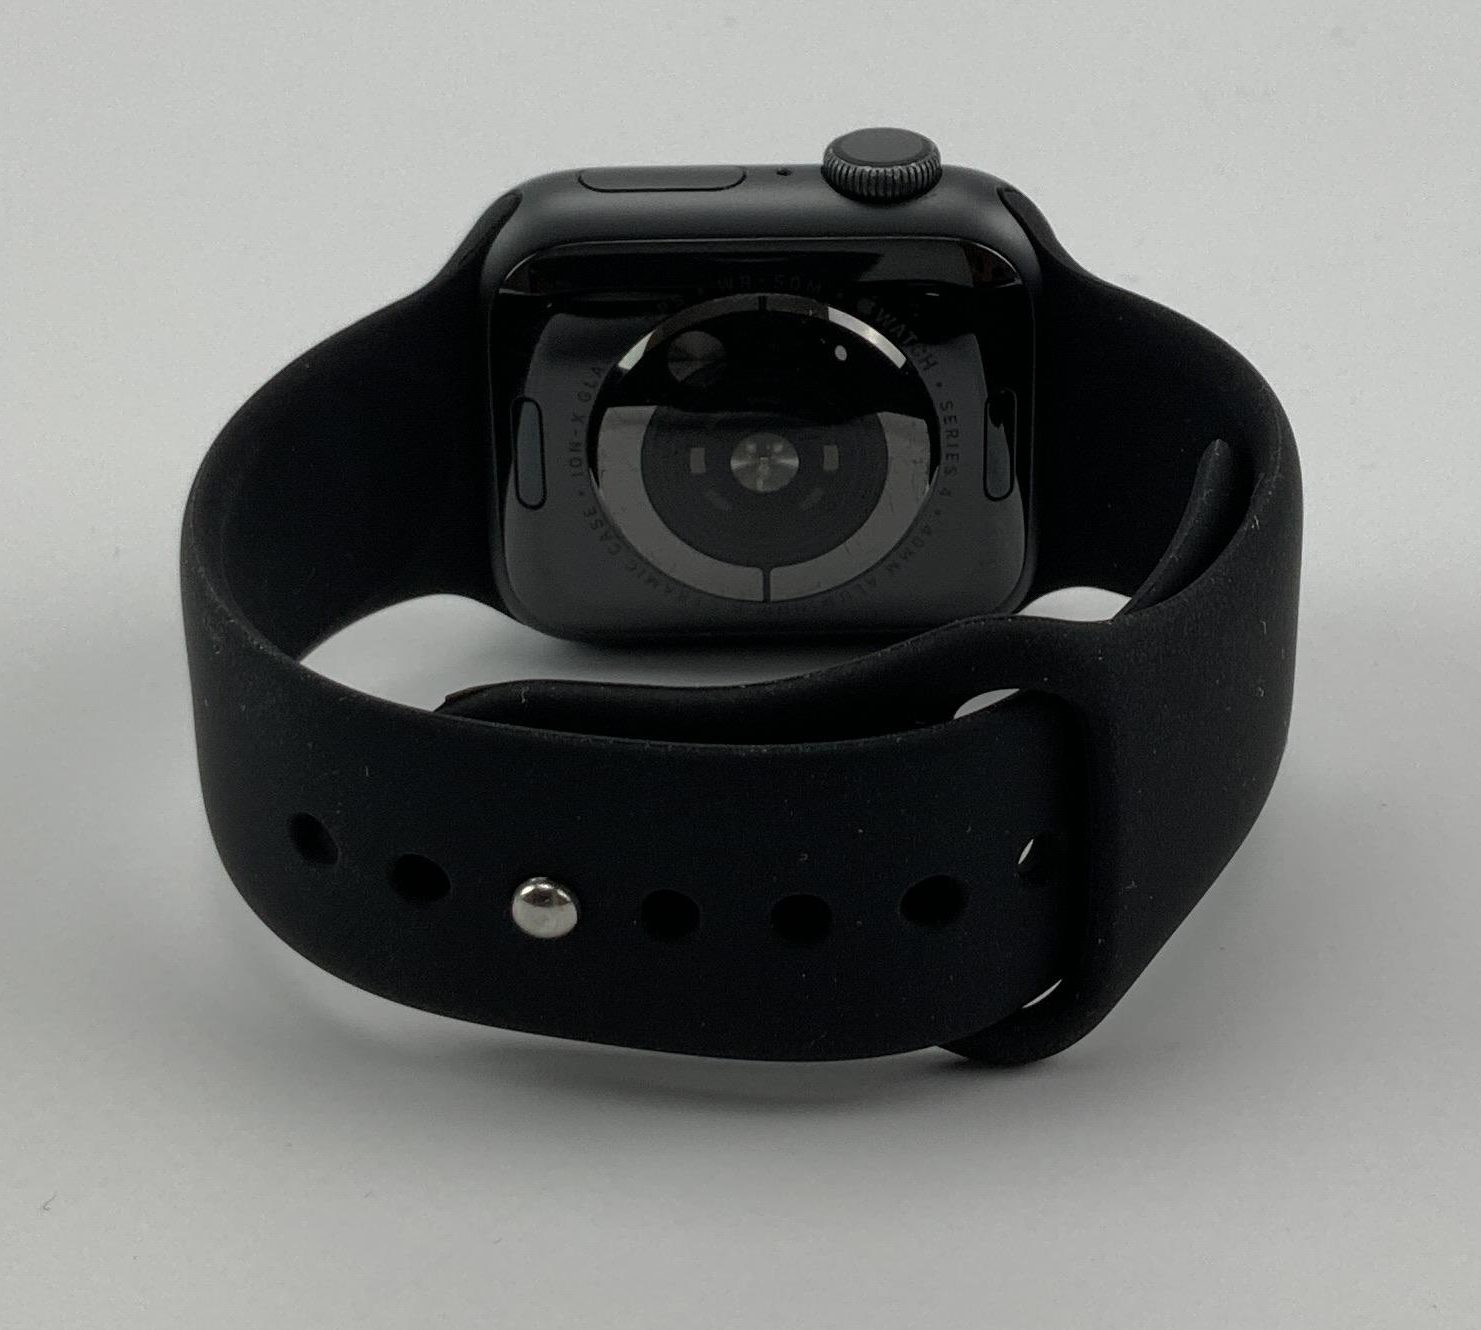 Watch Series 4 Aluminum (40mm), Space Gray, Black Sport Band, imagen 5